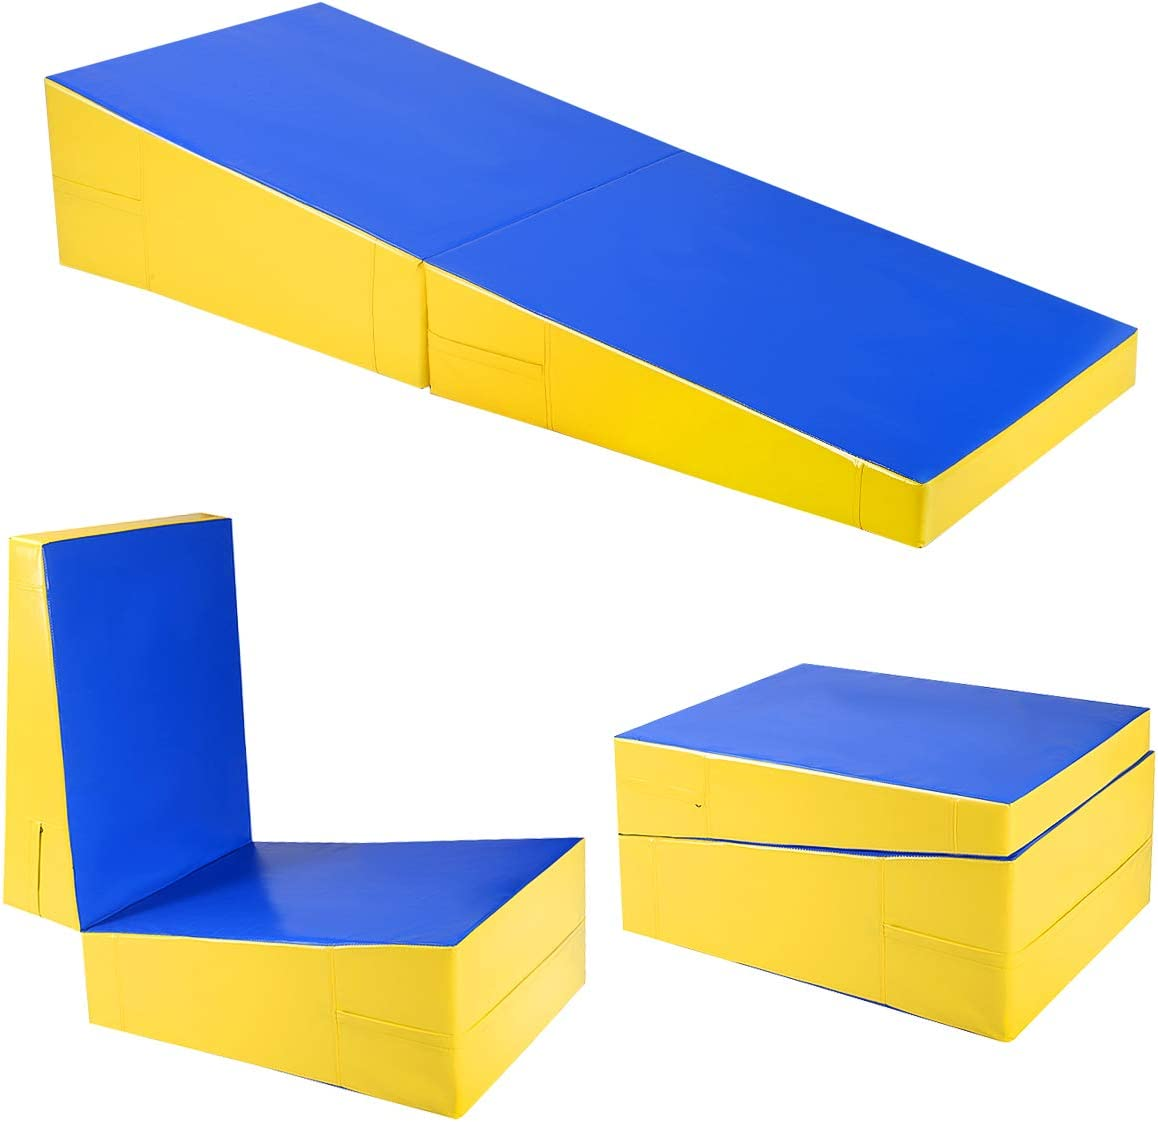 HI-MAT Cheese Mat Incline Wedge Mat 47x24x14 Gymnastics Ramp Cheese Slope Mat Skill Shape Tumbling Mat Gym Fitness